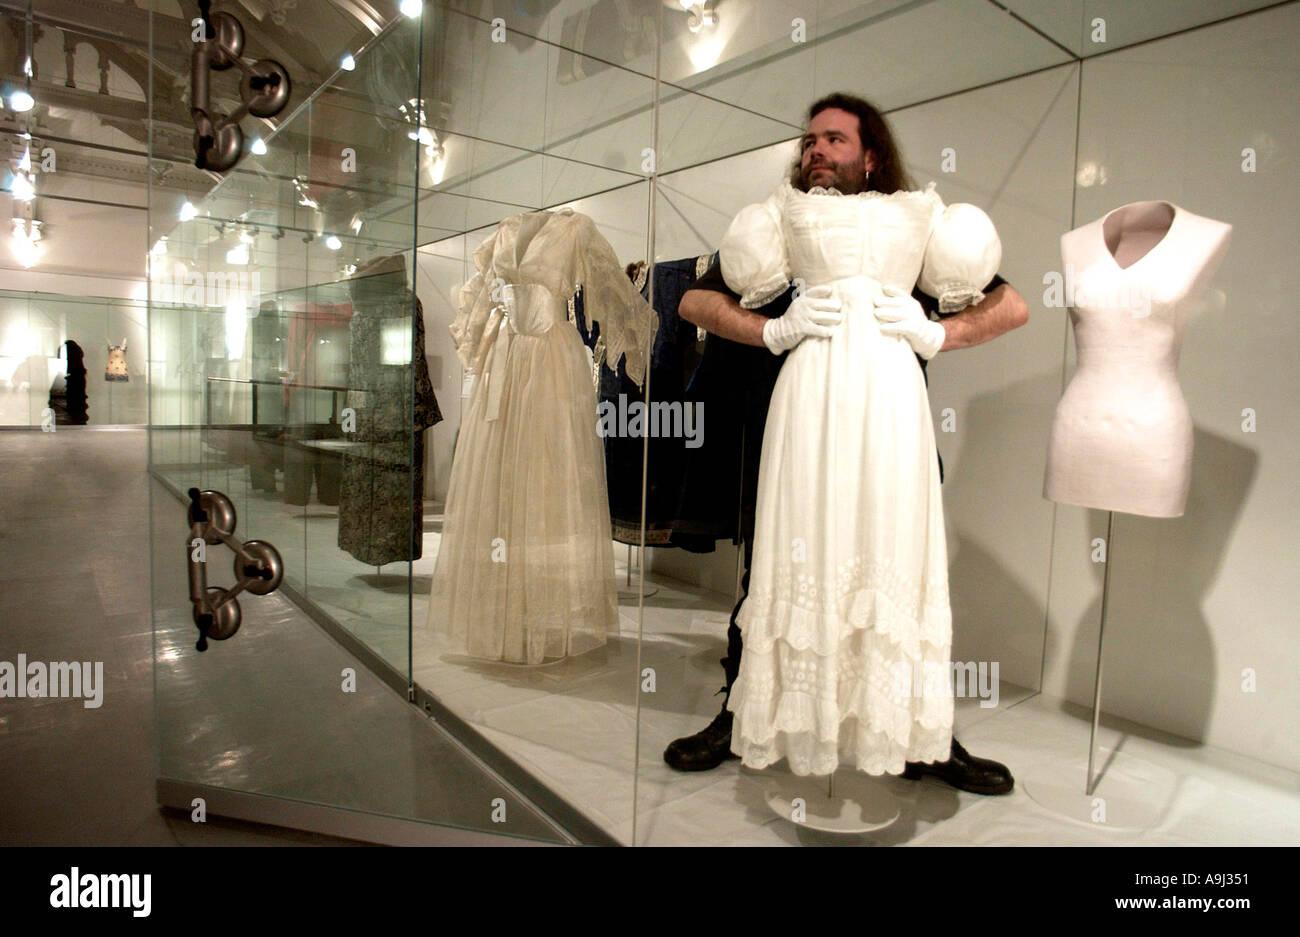 Regency Dress Stock Photos & Regency Dress Stock Images - Alamy